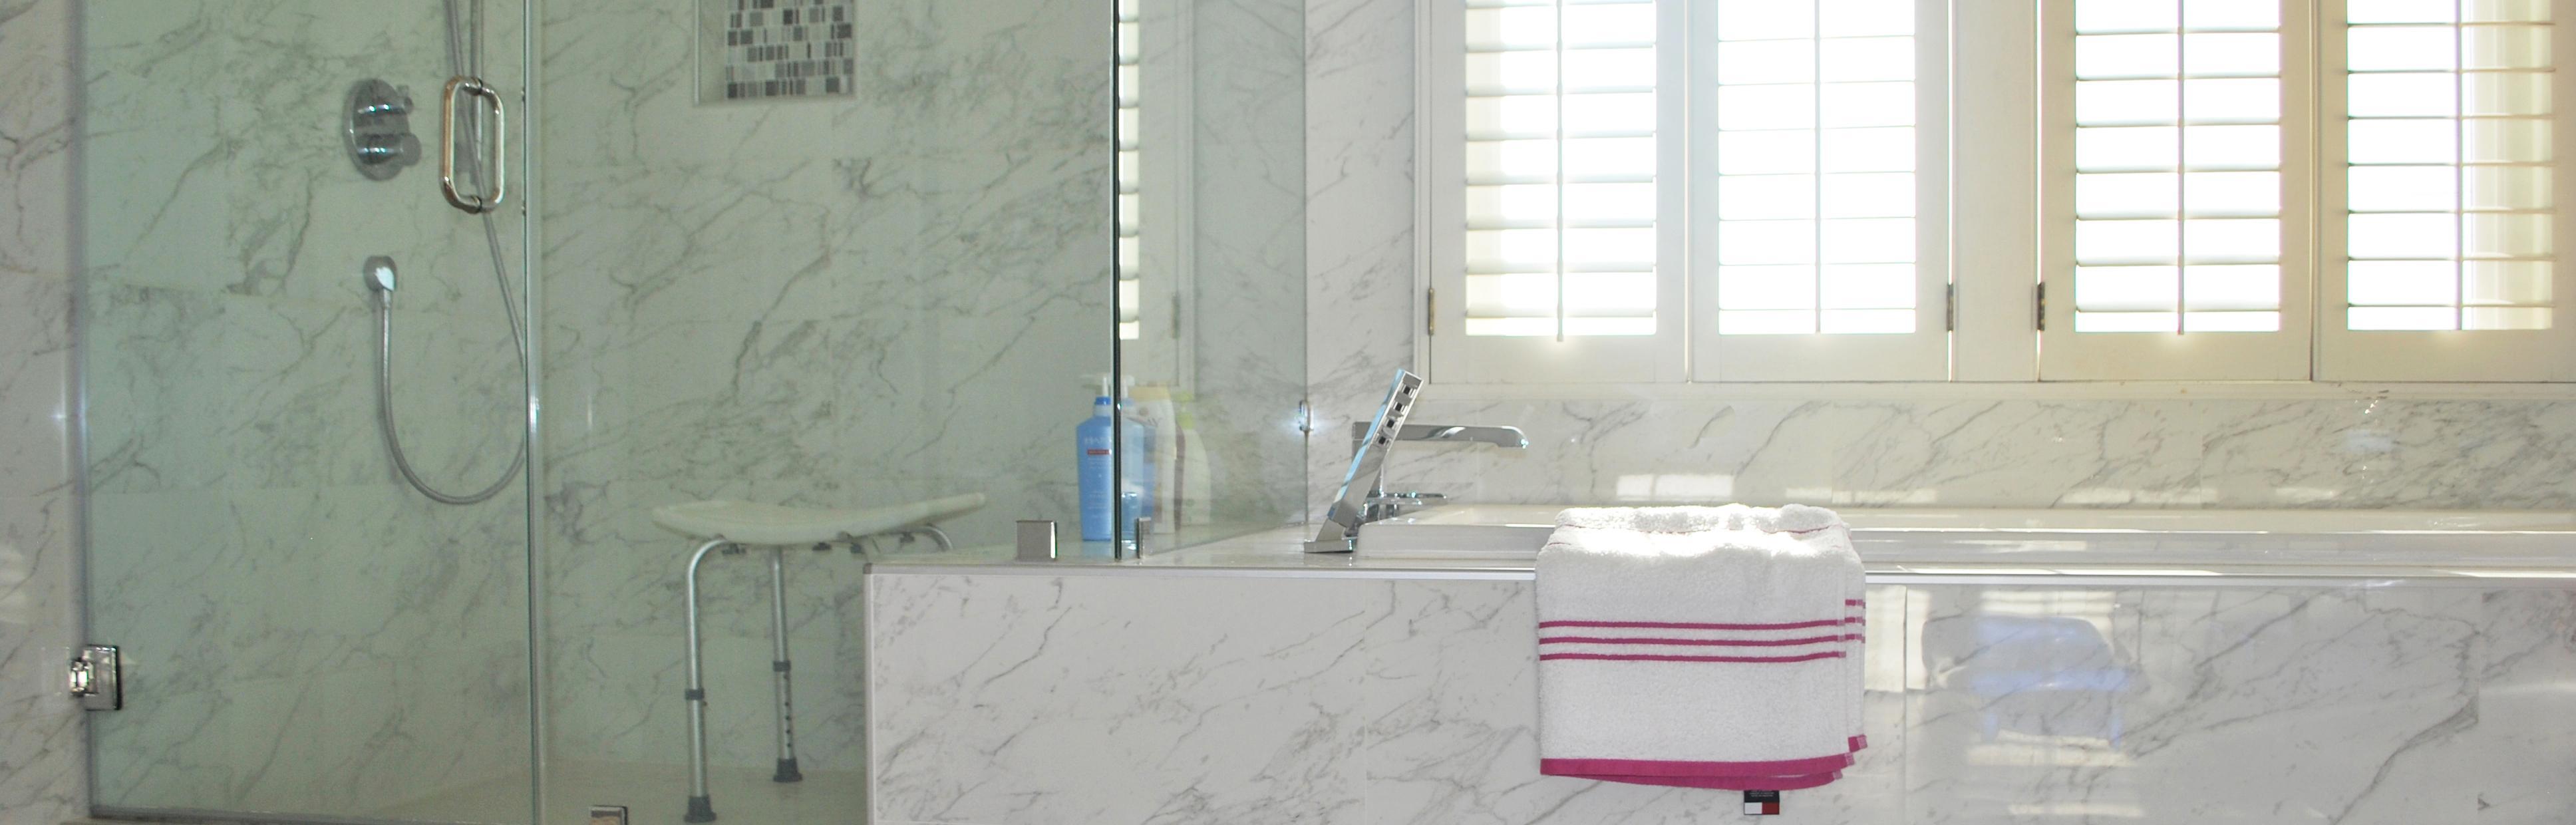 Amazon.com: BalanceFrom Adjustable Height Bath Shower Tub Bench ...